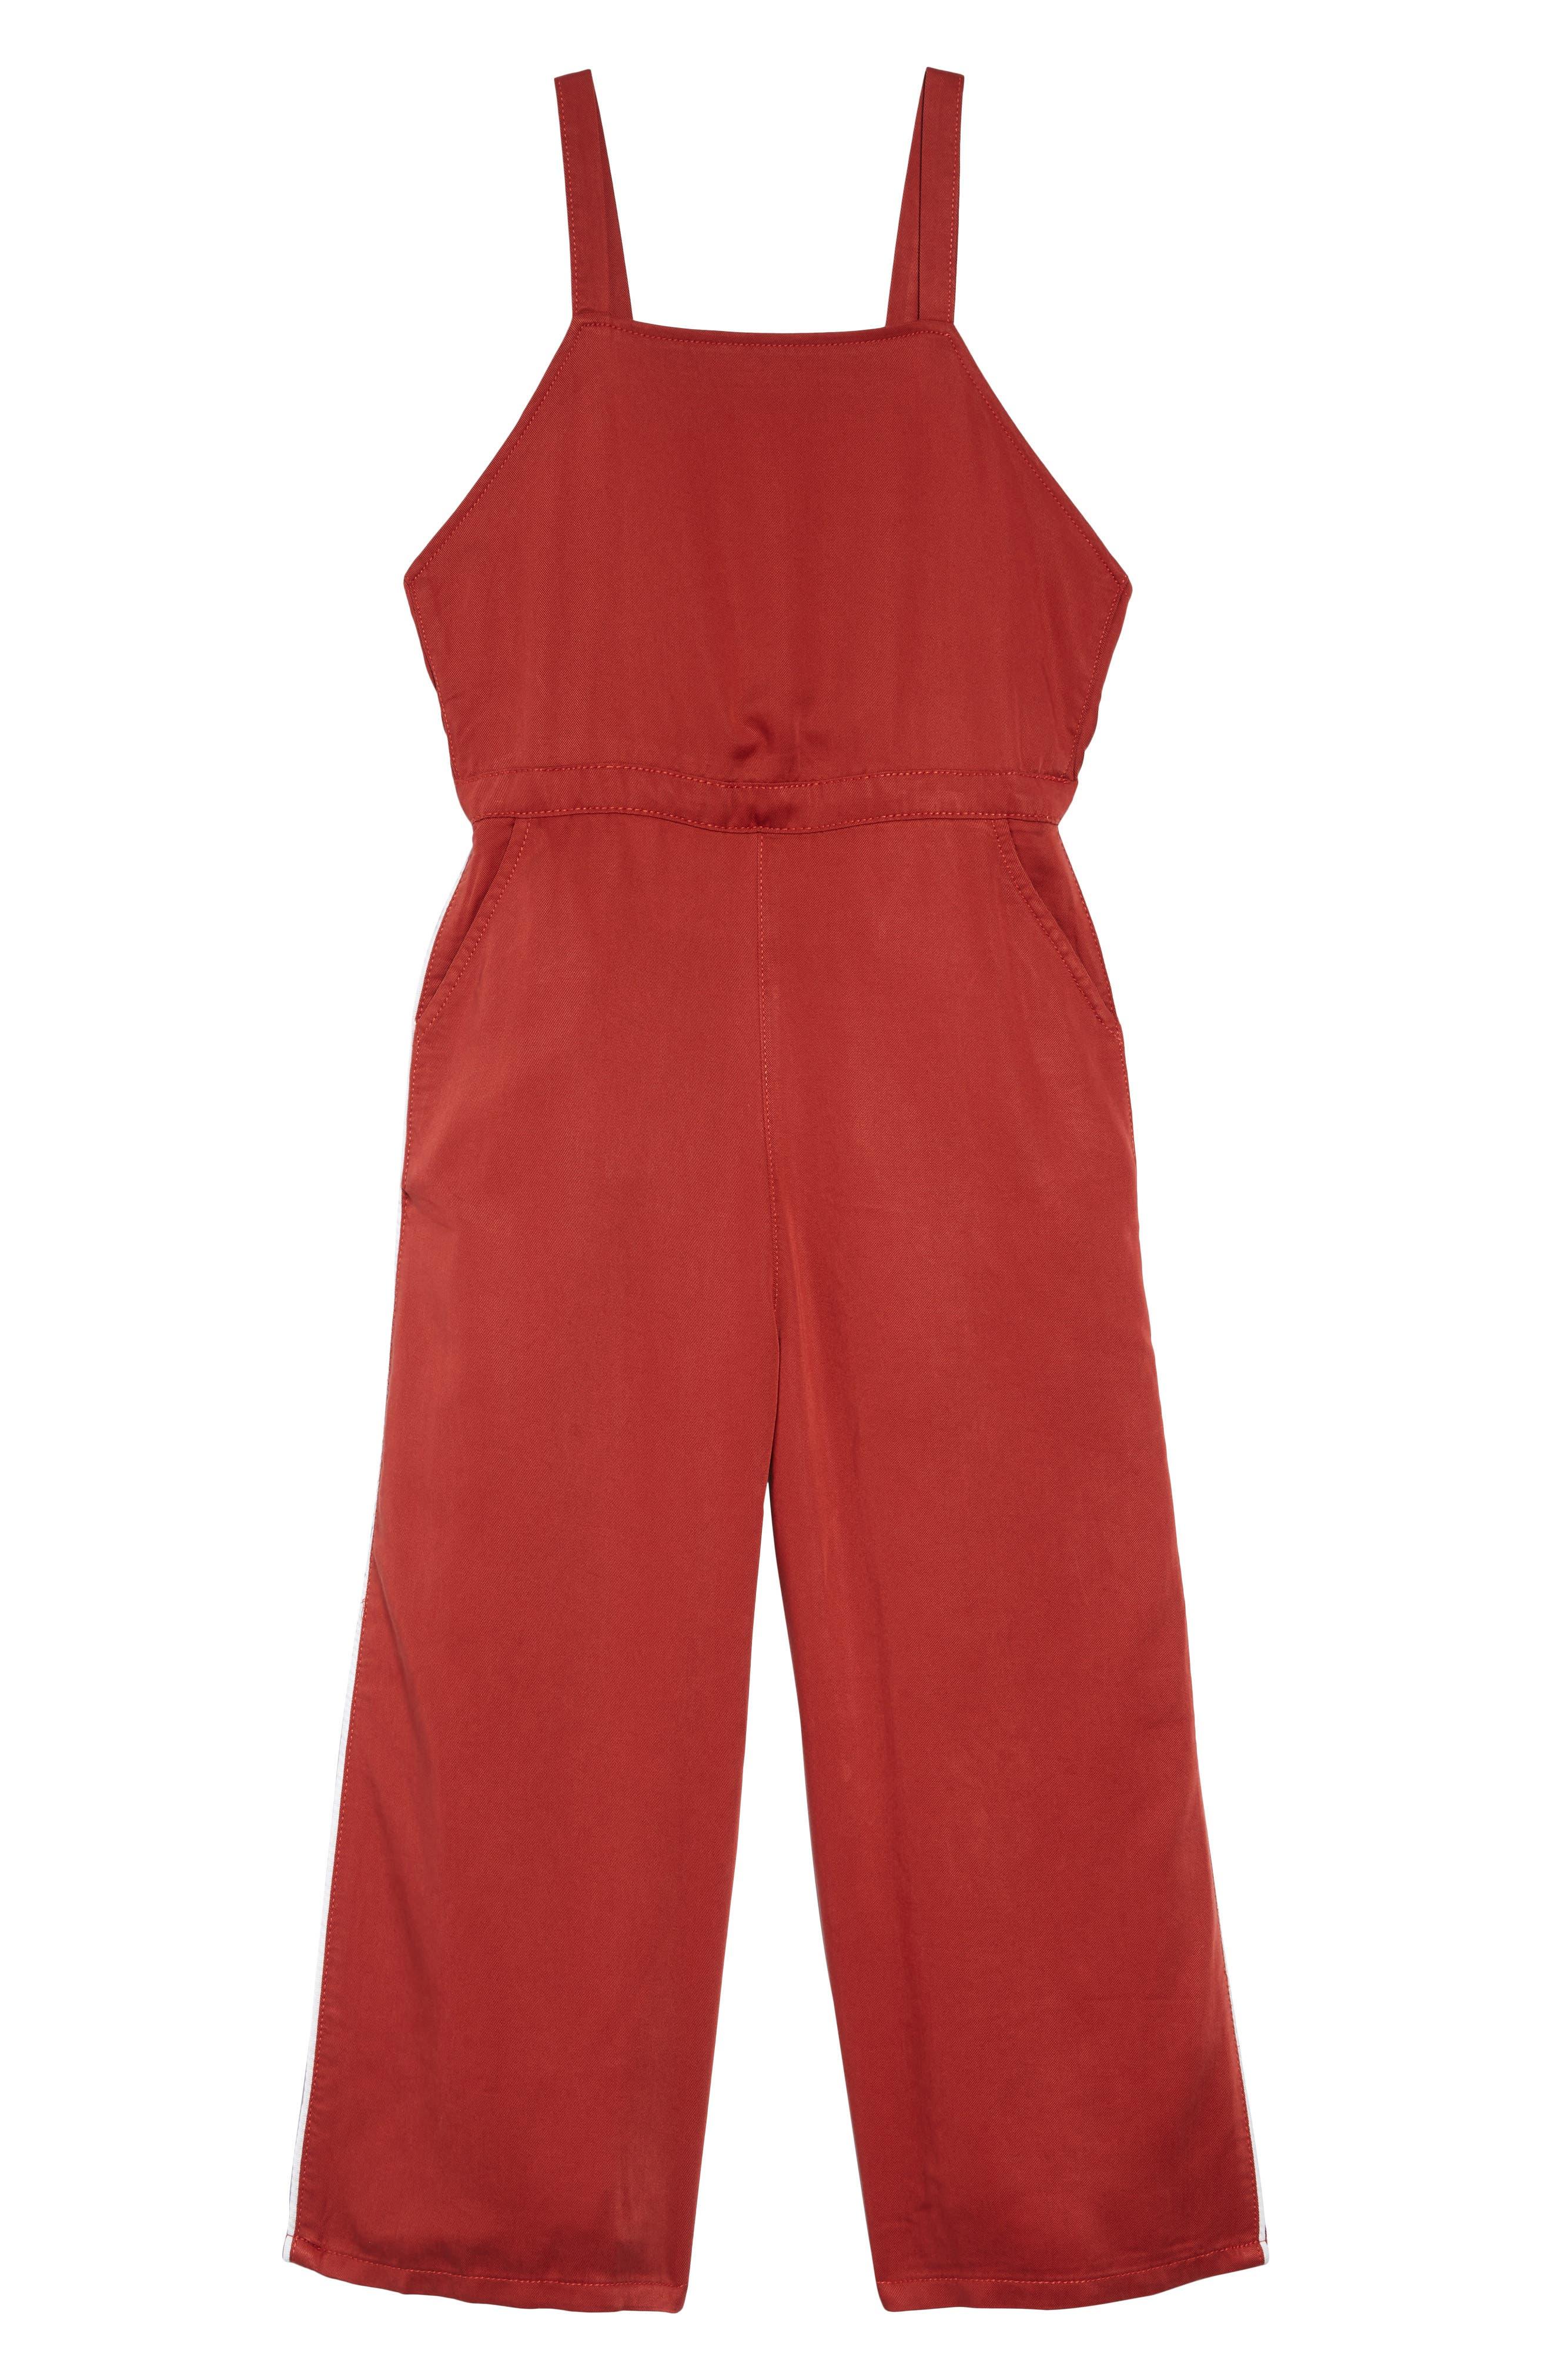 TREASURE & BOND Sporty Jumpsuit, Main, color, RED OCHRE